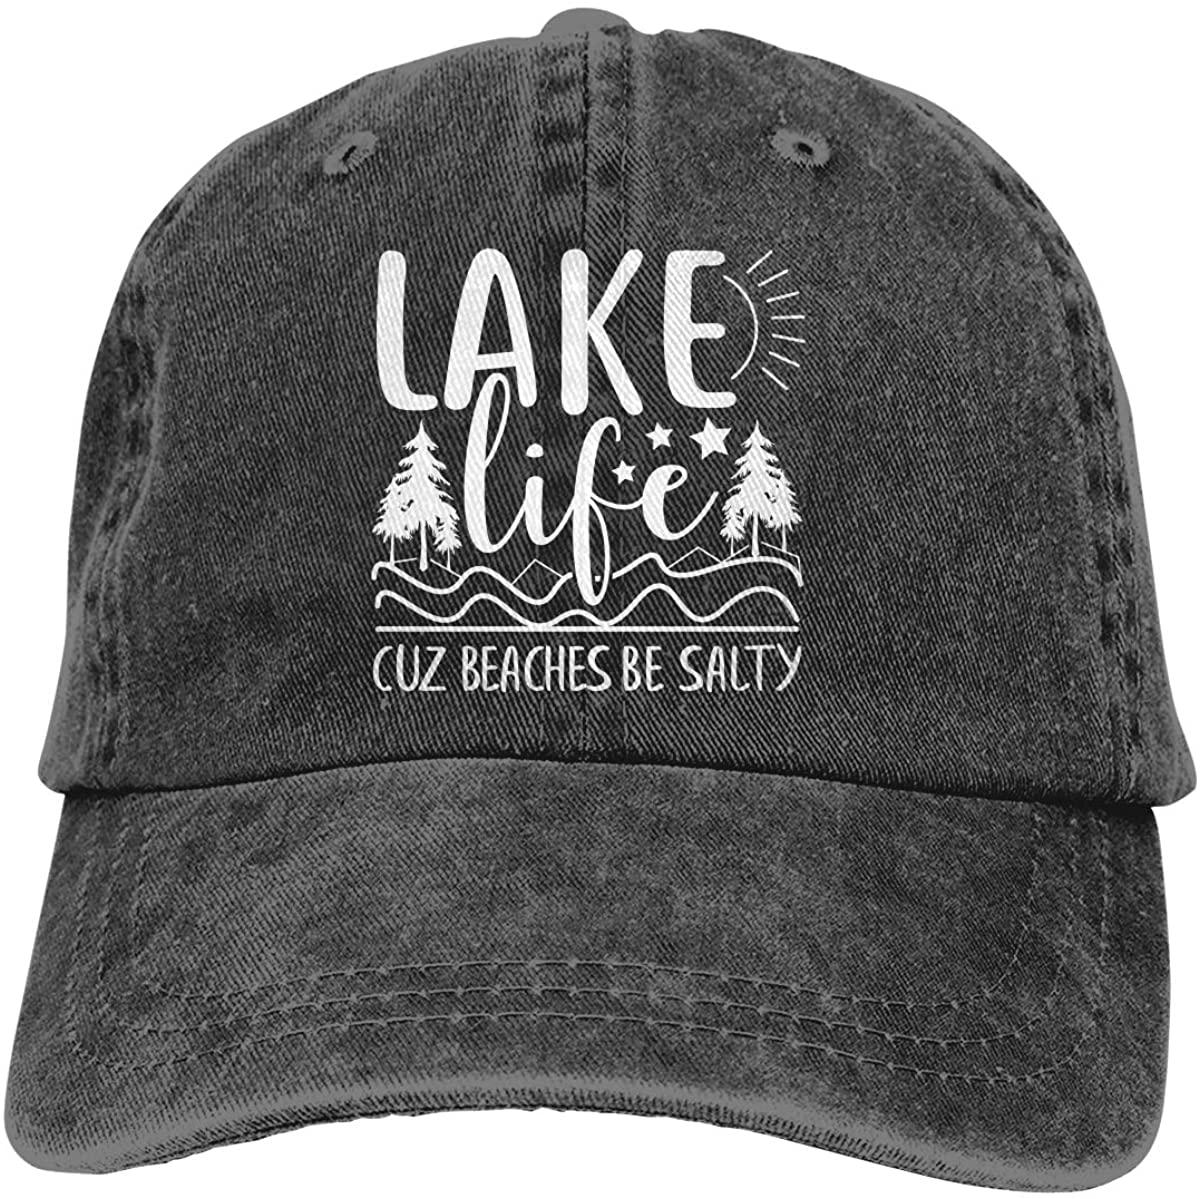 LOKIDVE Women's Lake Life Cuz Beaches Be Salty Baseball Cap Vintage Dad Hat Black